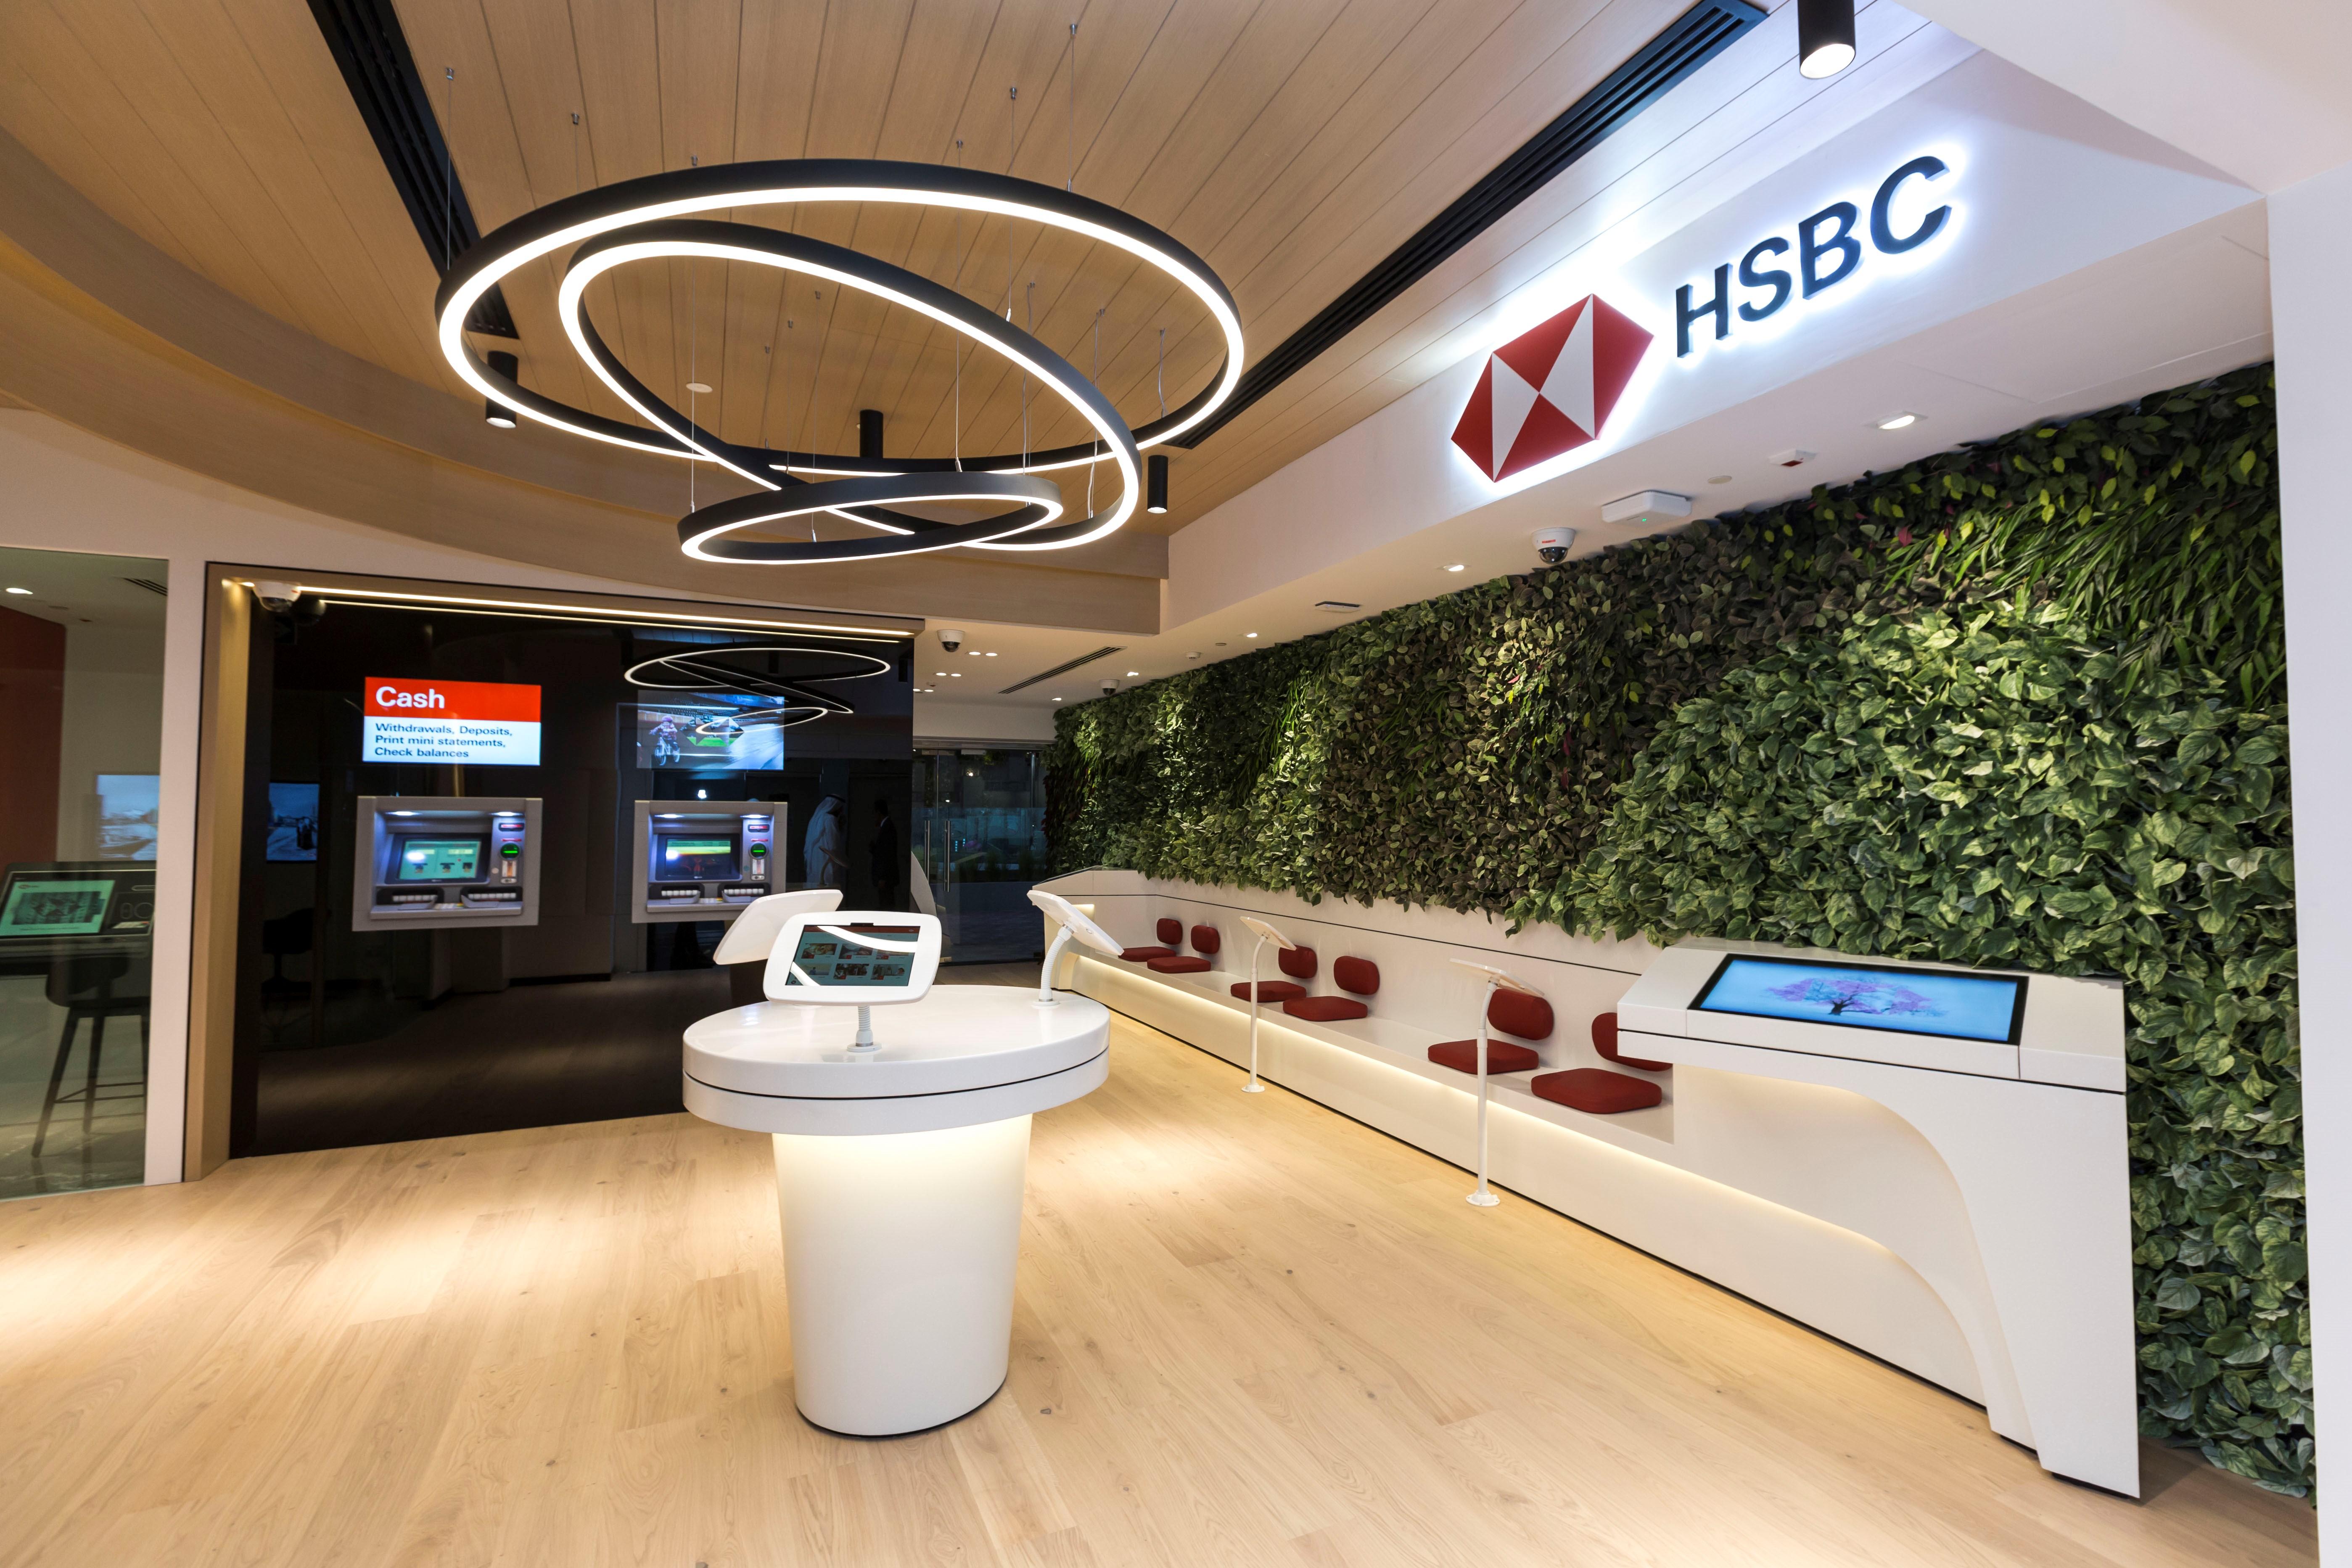 Media gallery | HSBC Holdings plc